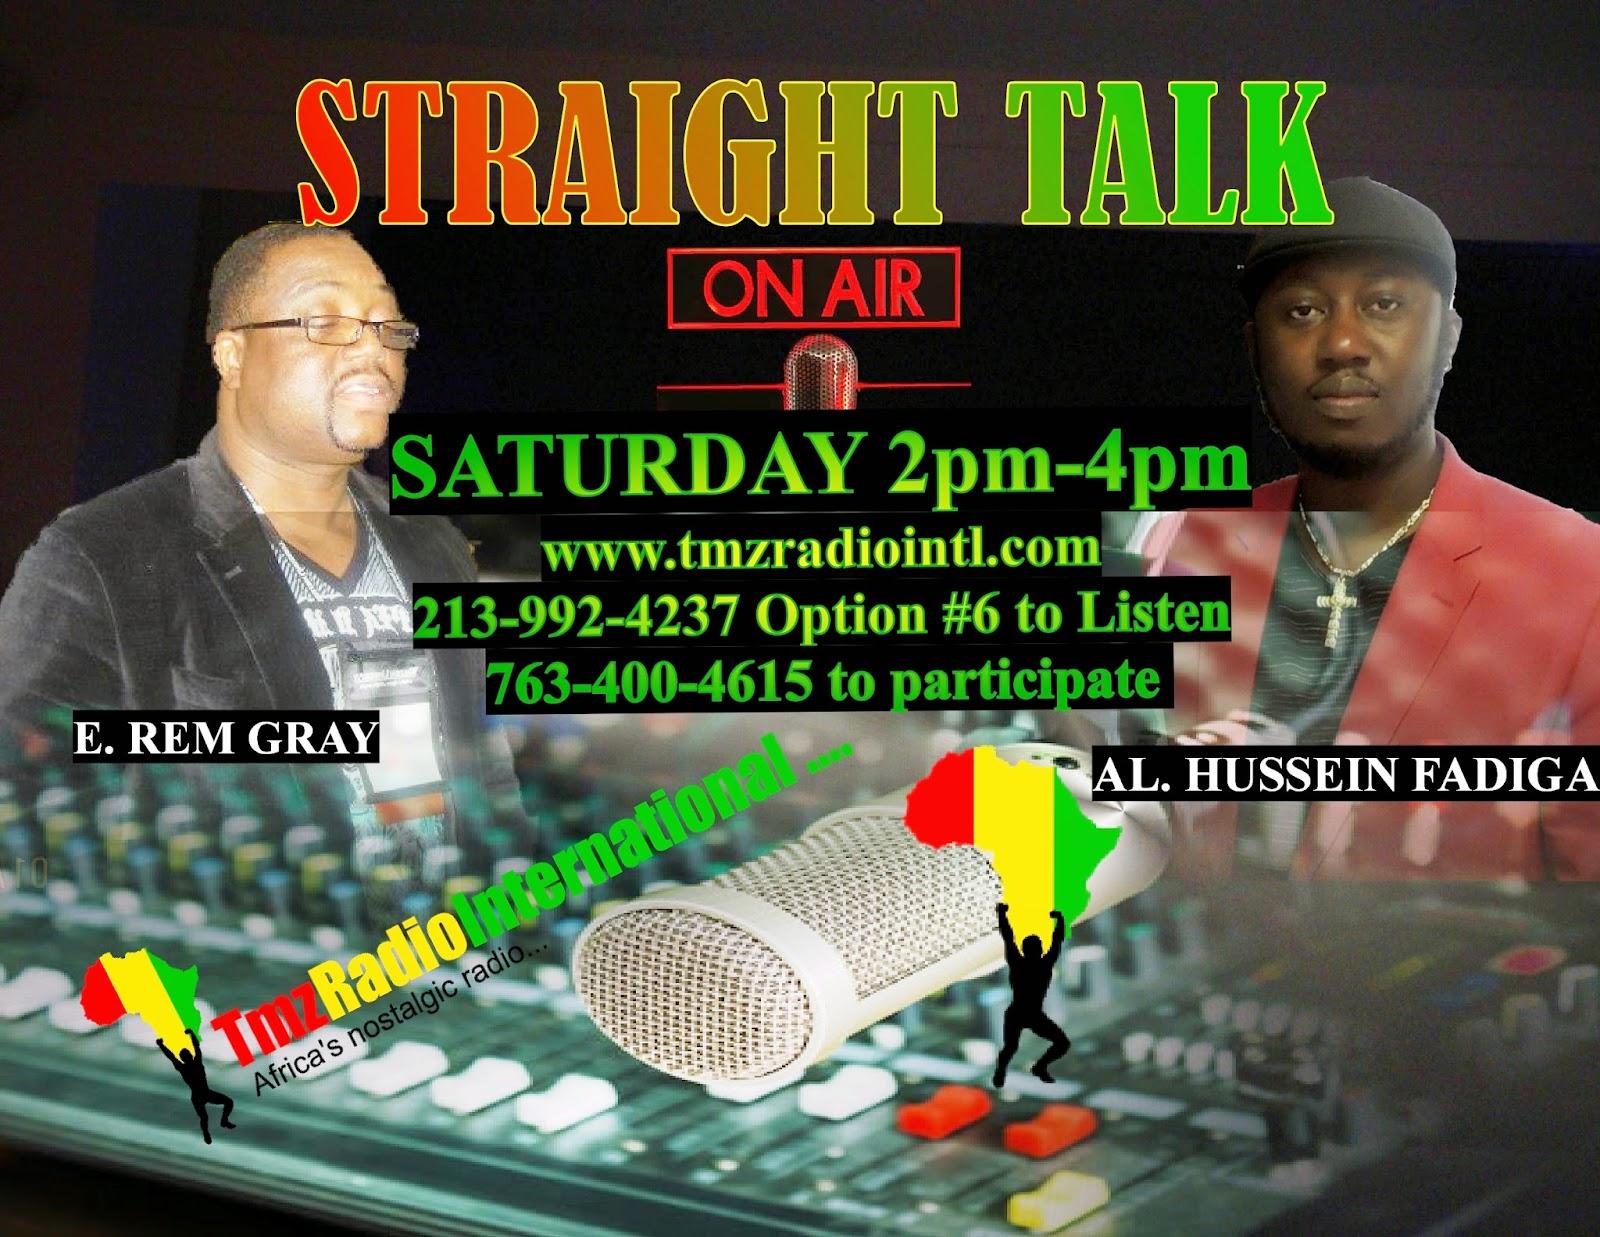 STRAIGHT TALK ON TMZ RADIO INTERNATIONAL